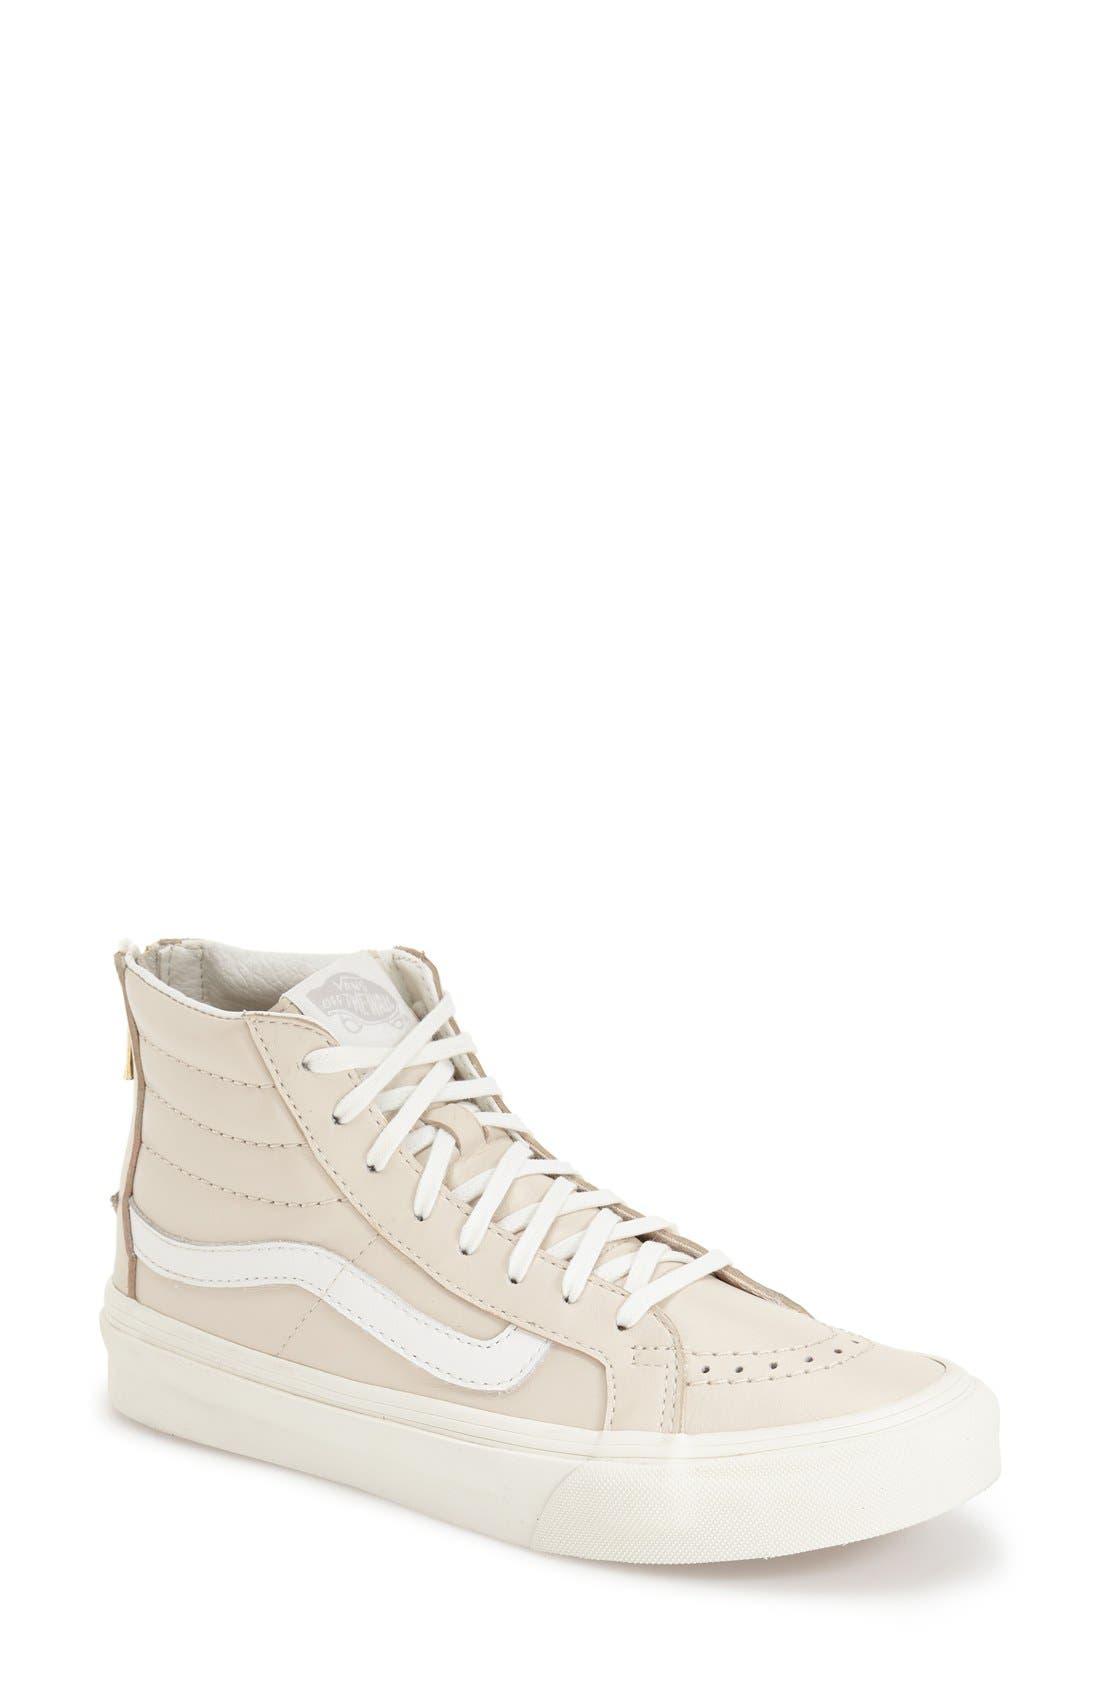 Alternate Image 1 Selected - Vans 'Sk8-Hi Slim' High Top Sneaker (Women)